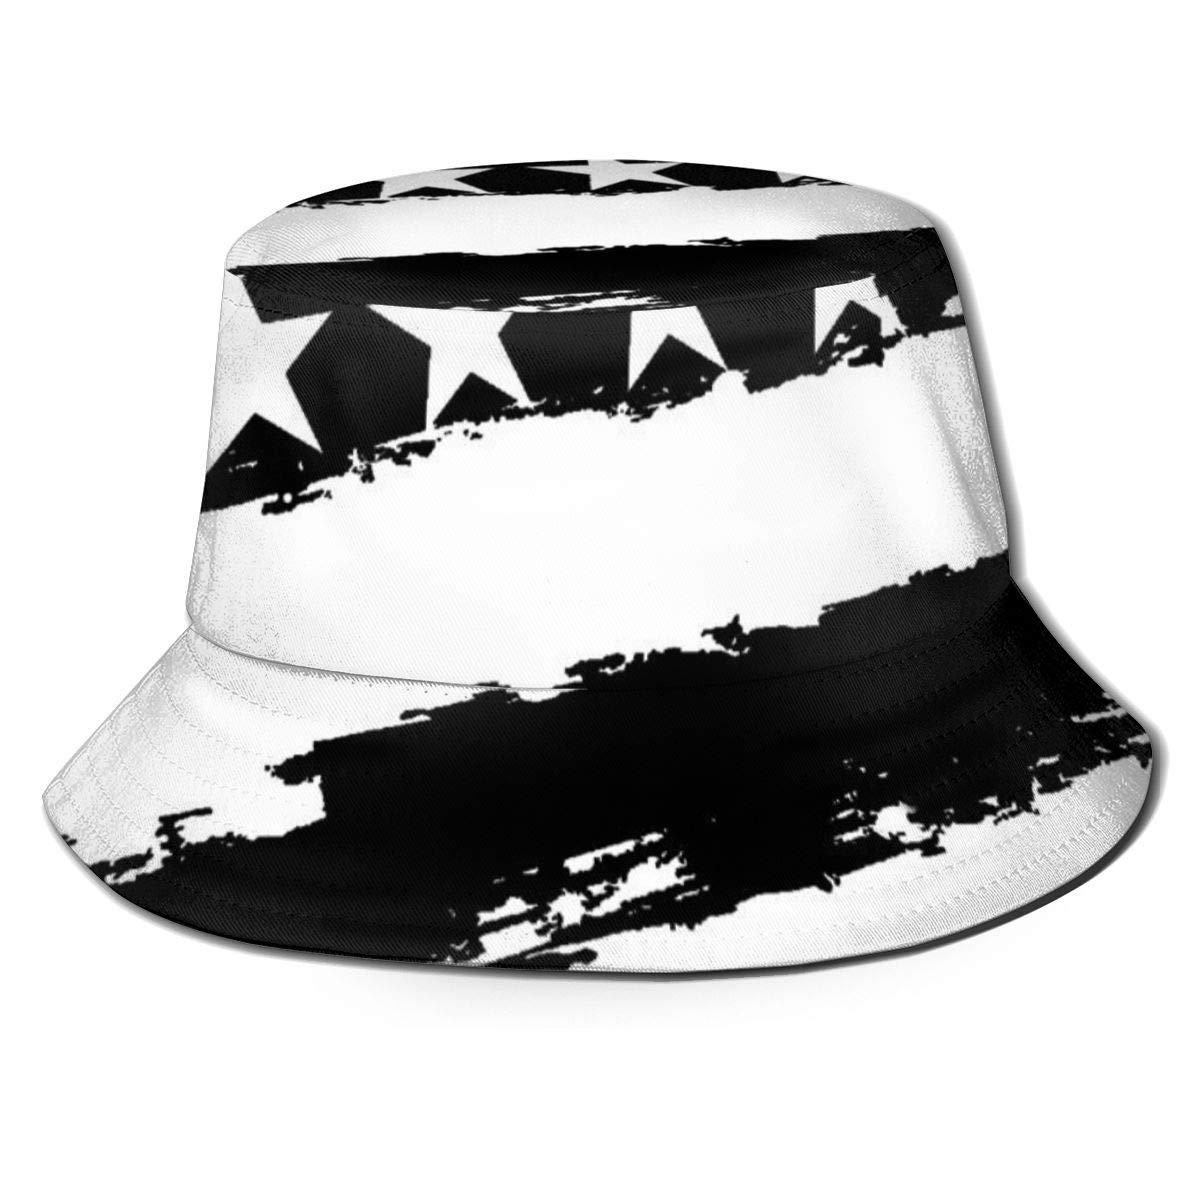 Soft Mesh Back Trucker Hat for Unisex Boys and Girls 100/% Polyester Black and White American Flag Mesh Cap